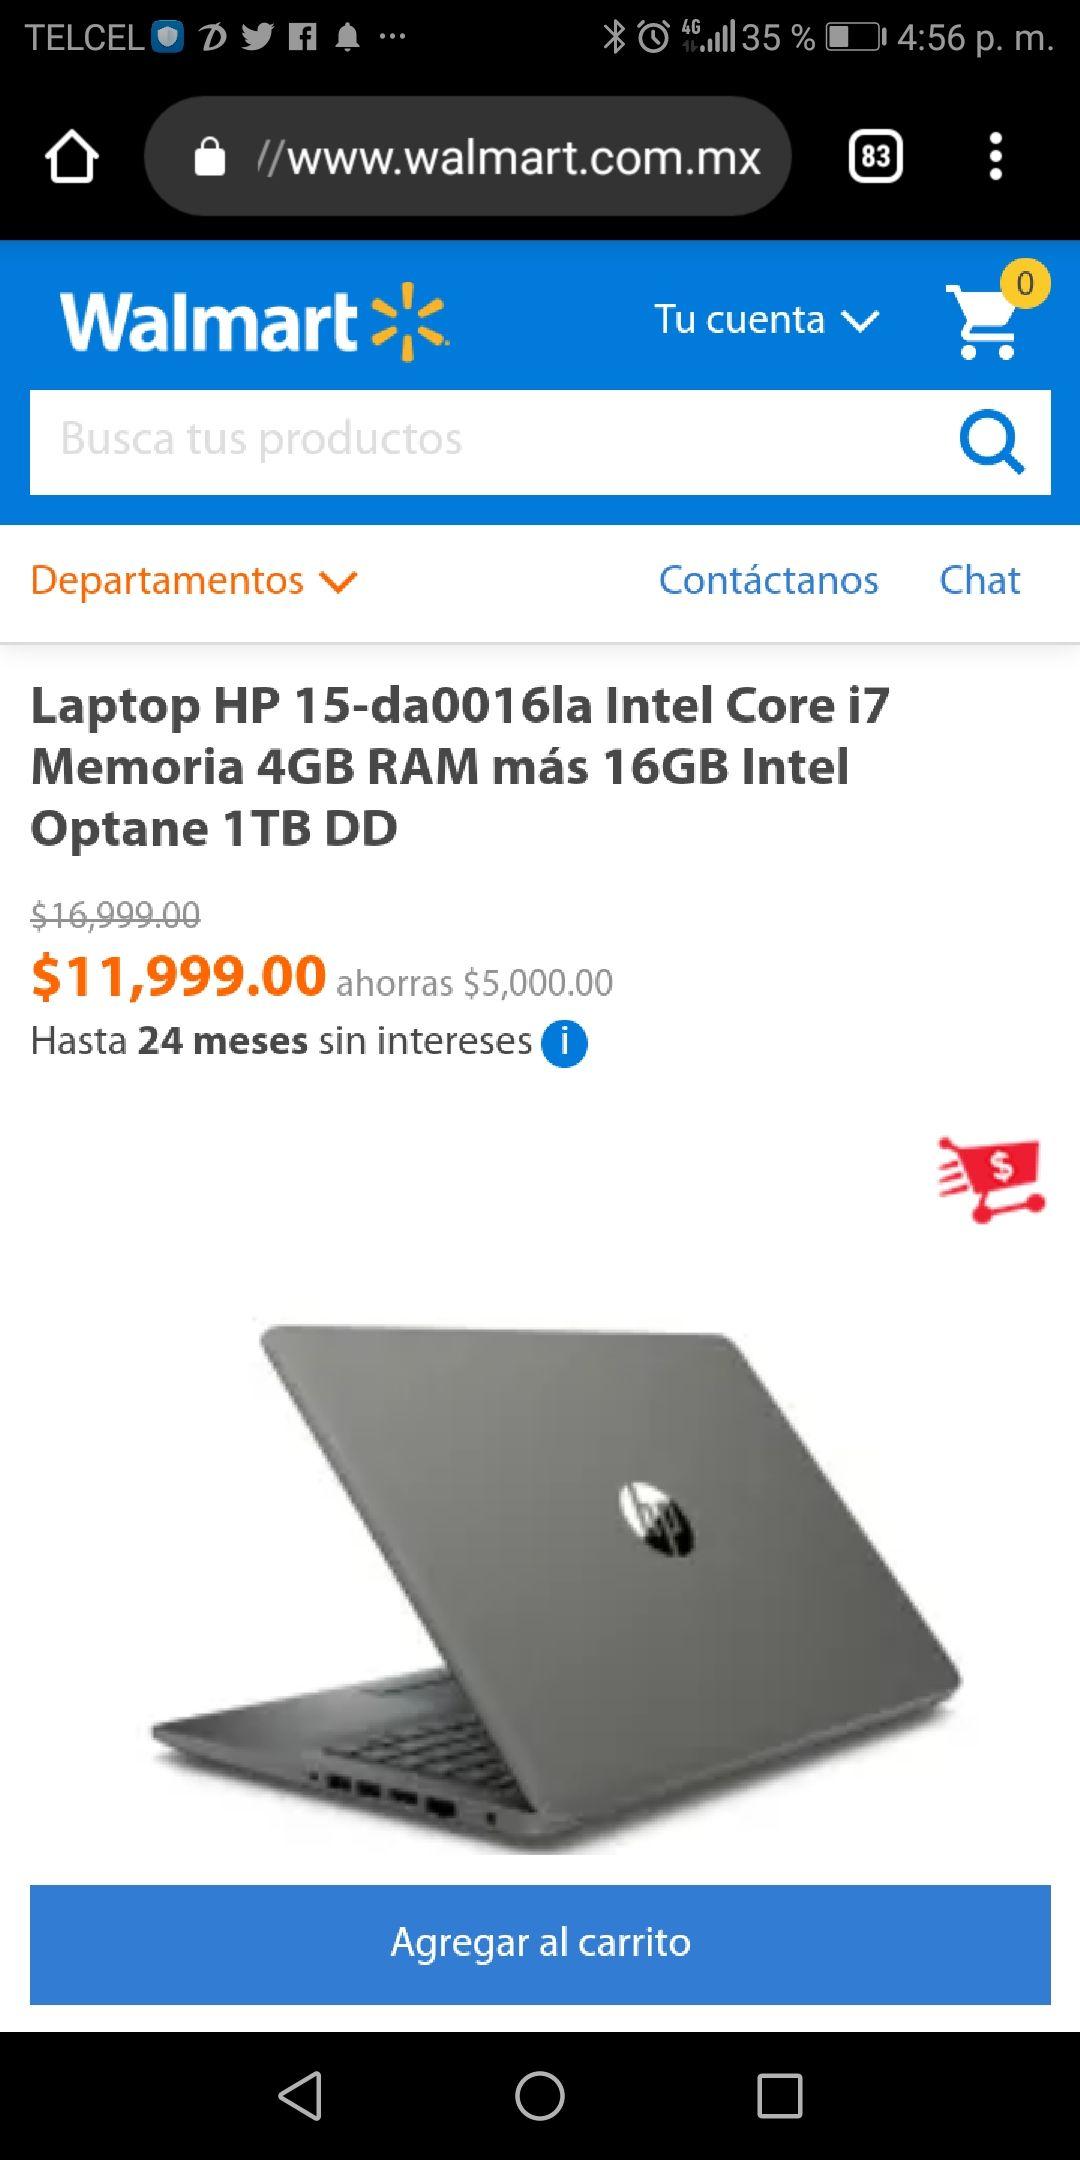 Hot Days 2019 Walmart: Laptop HP 15-da0016la Intel Core i7 8va Gen, 4GB RAM, 16GB Intel Optane, 1TB Pagando con Bancomer o Inbursa a 18 MSI